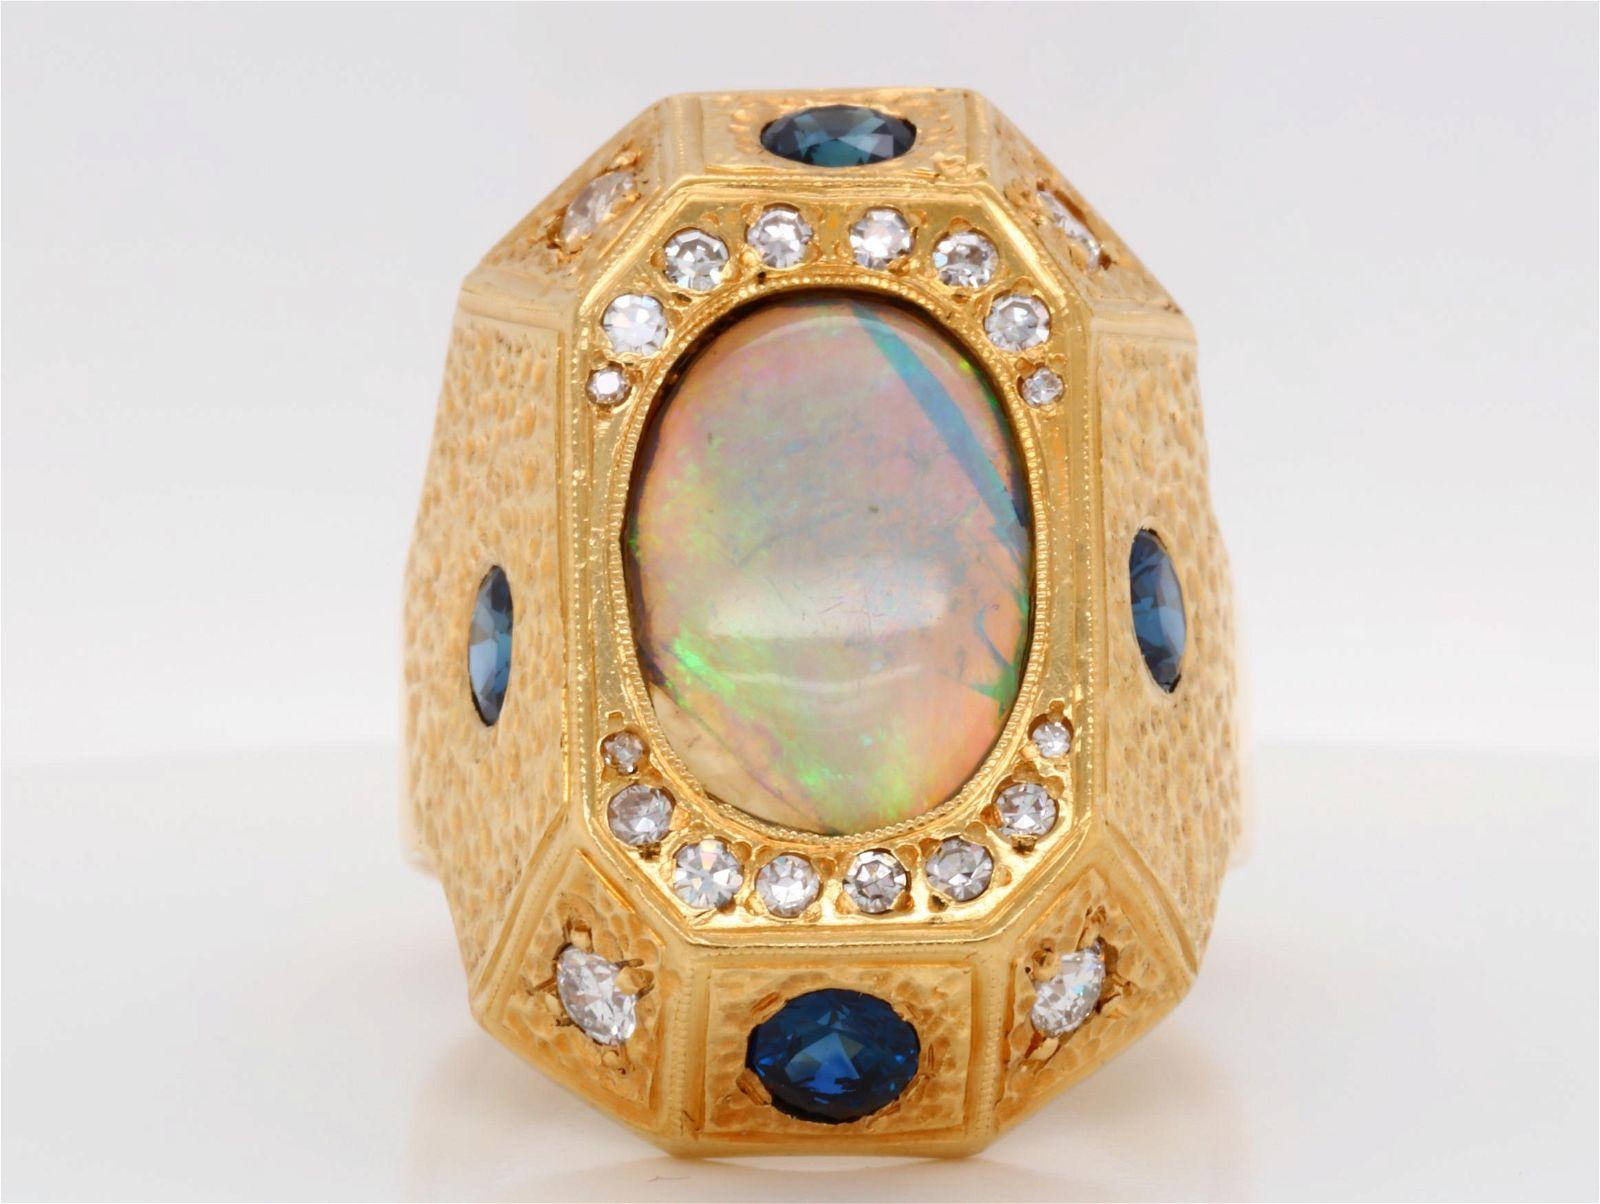 13mm Opal, 1.50ctw Blue Sapphire & Diamond Ring